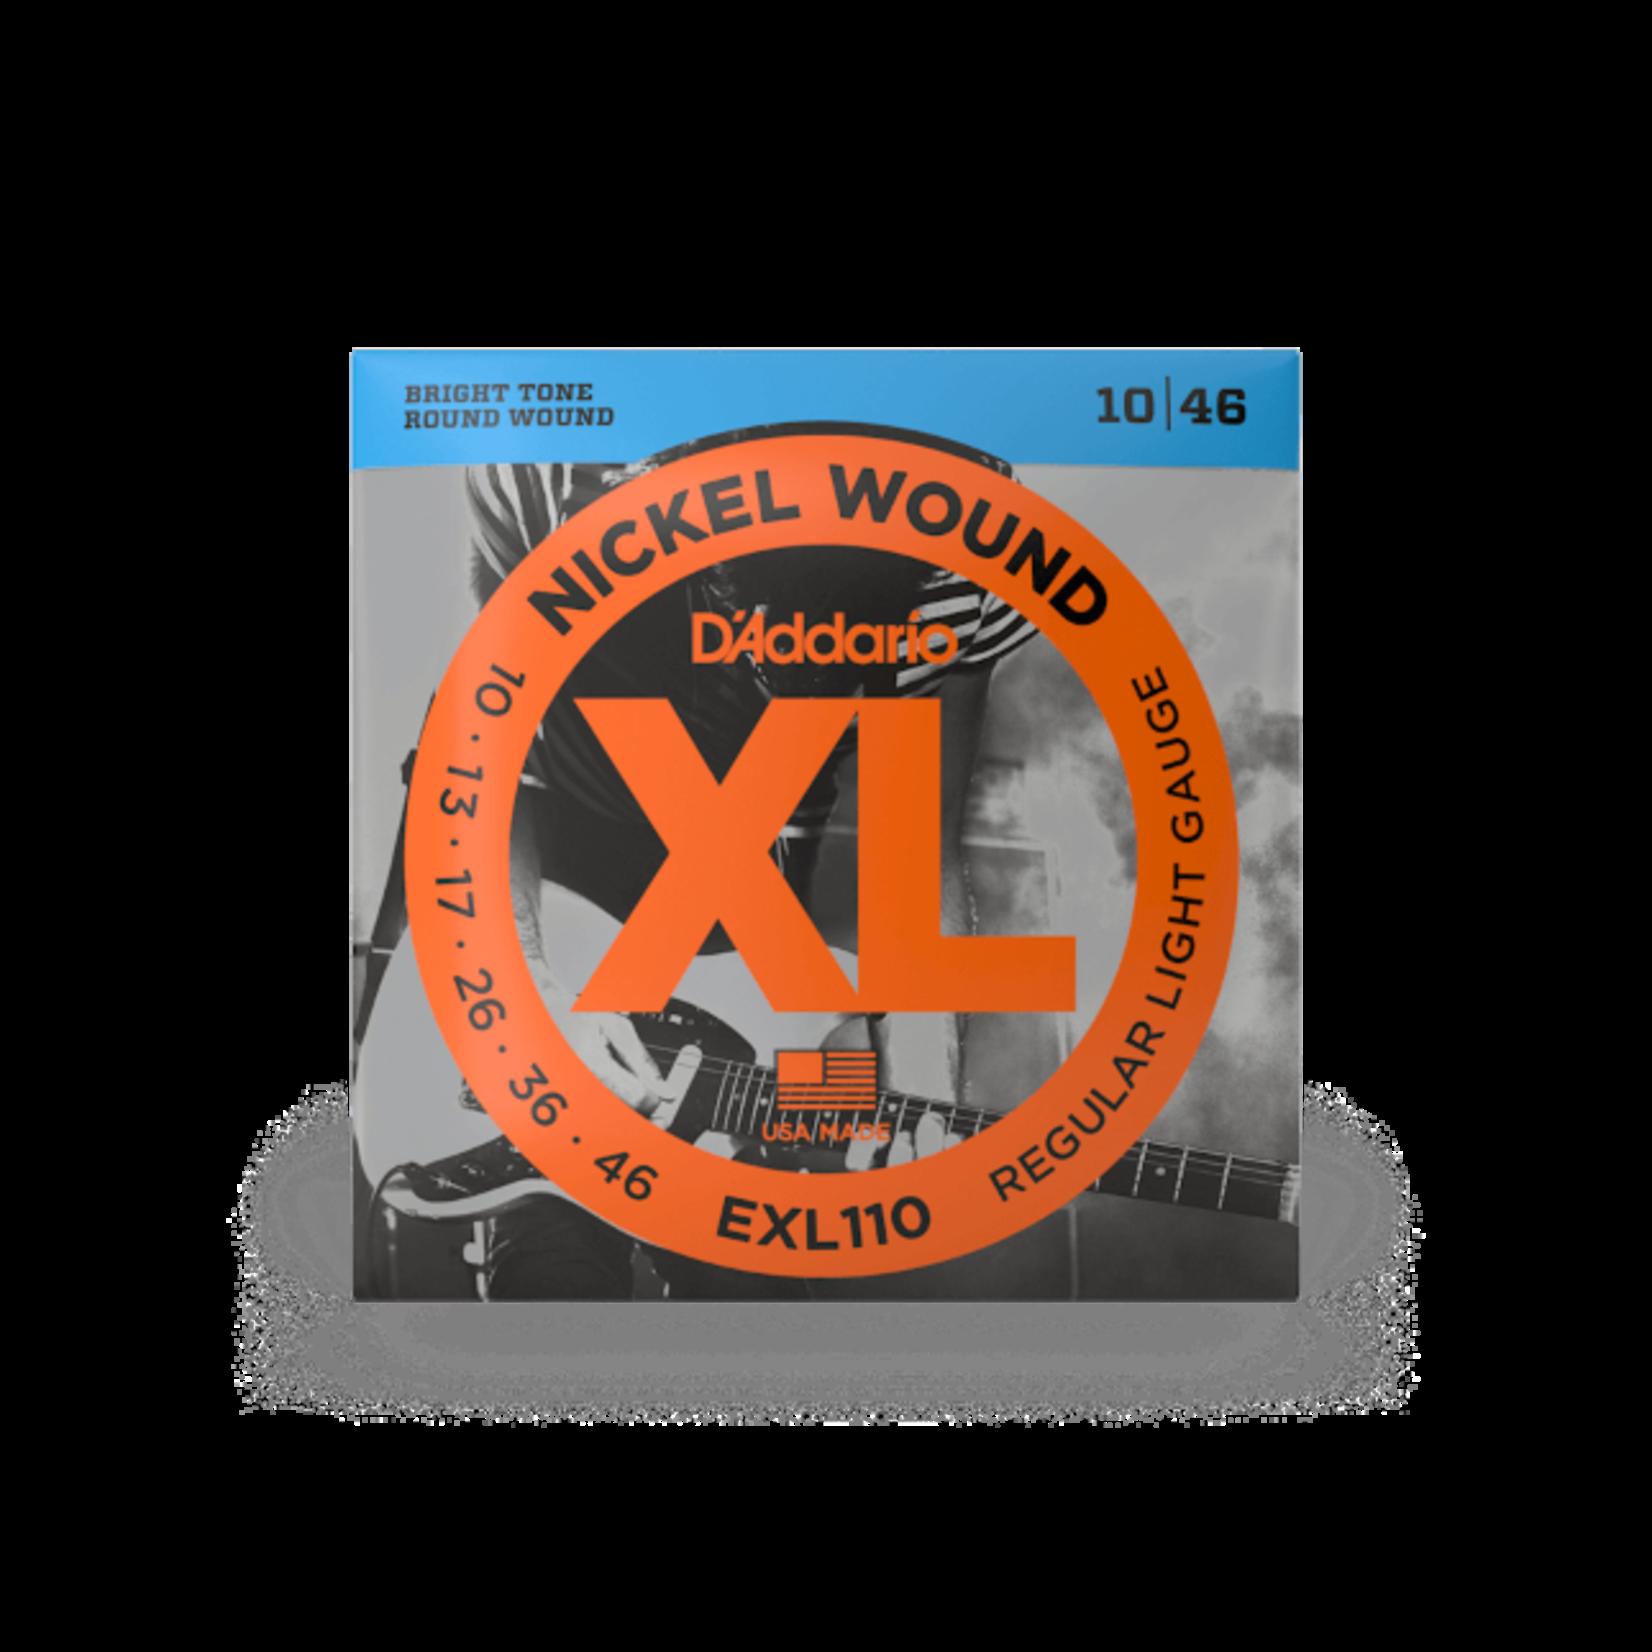 D'Addario D'Addario EXL110 Nickel Wound Electric Guitar Strings Regular Light 10-46